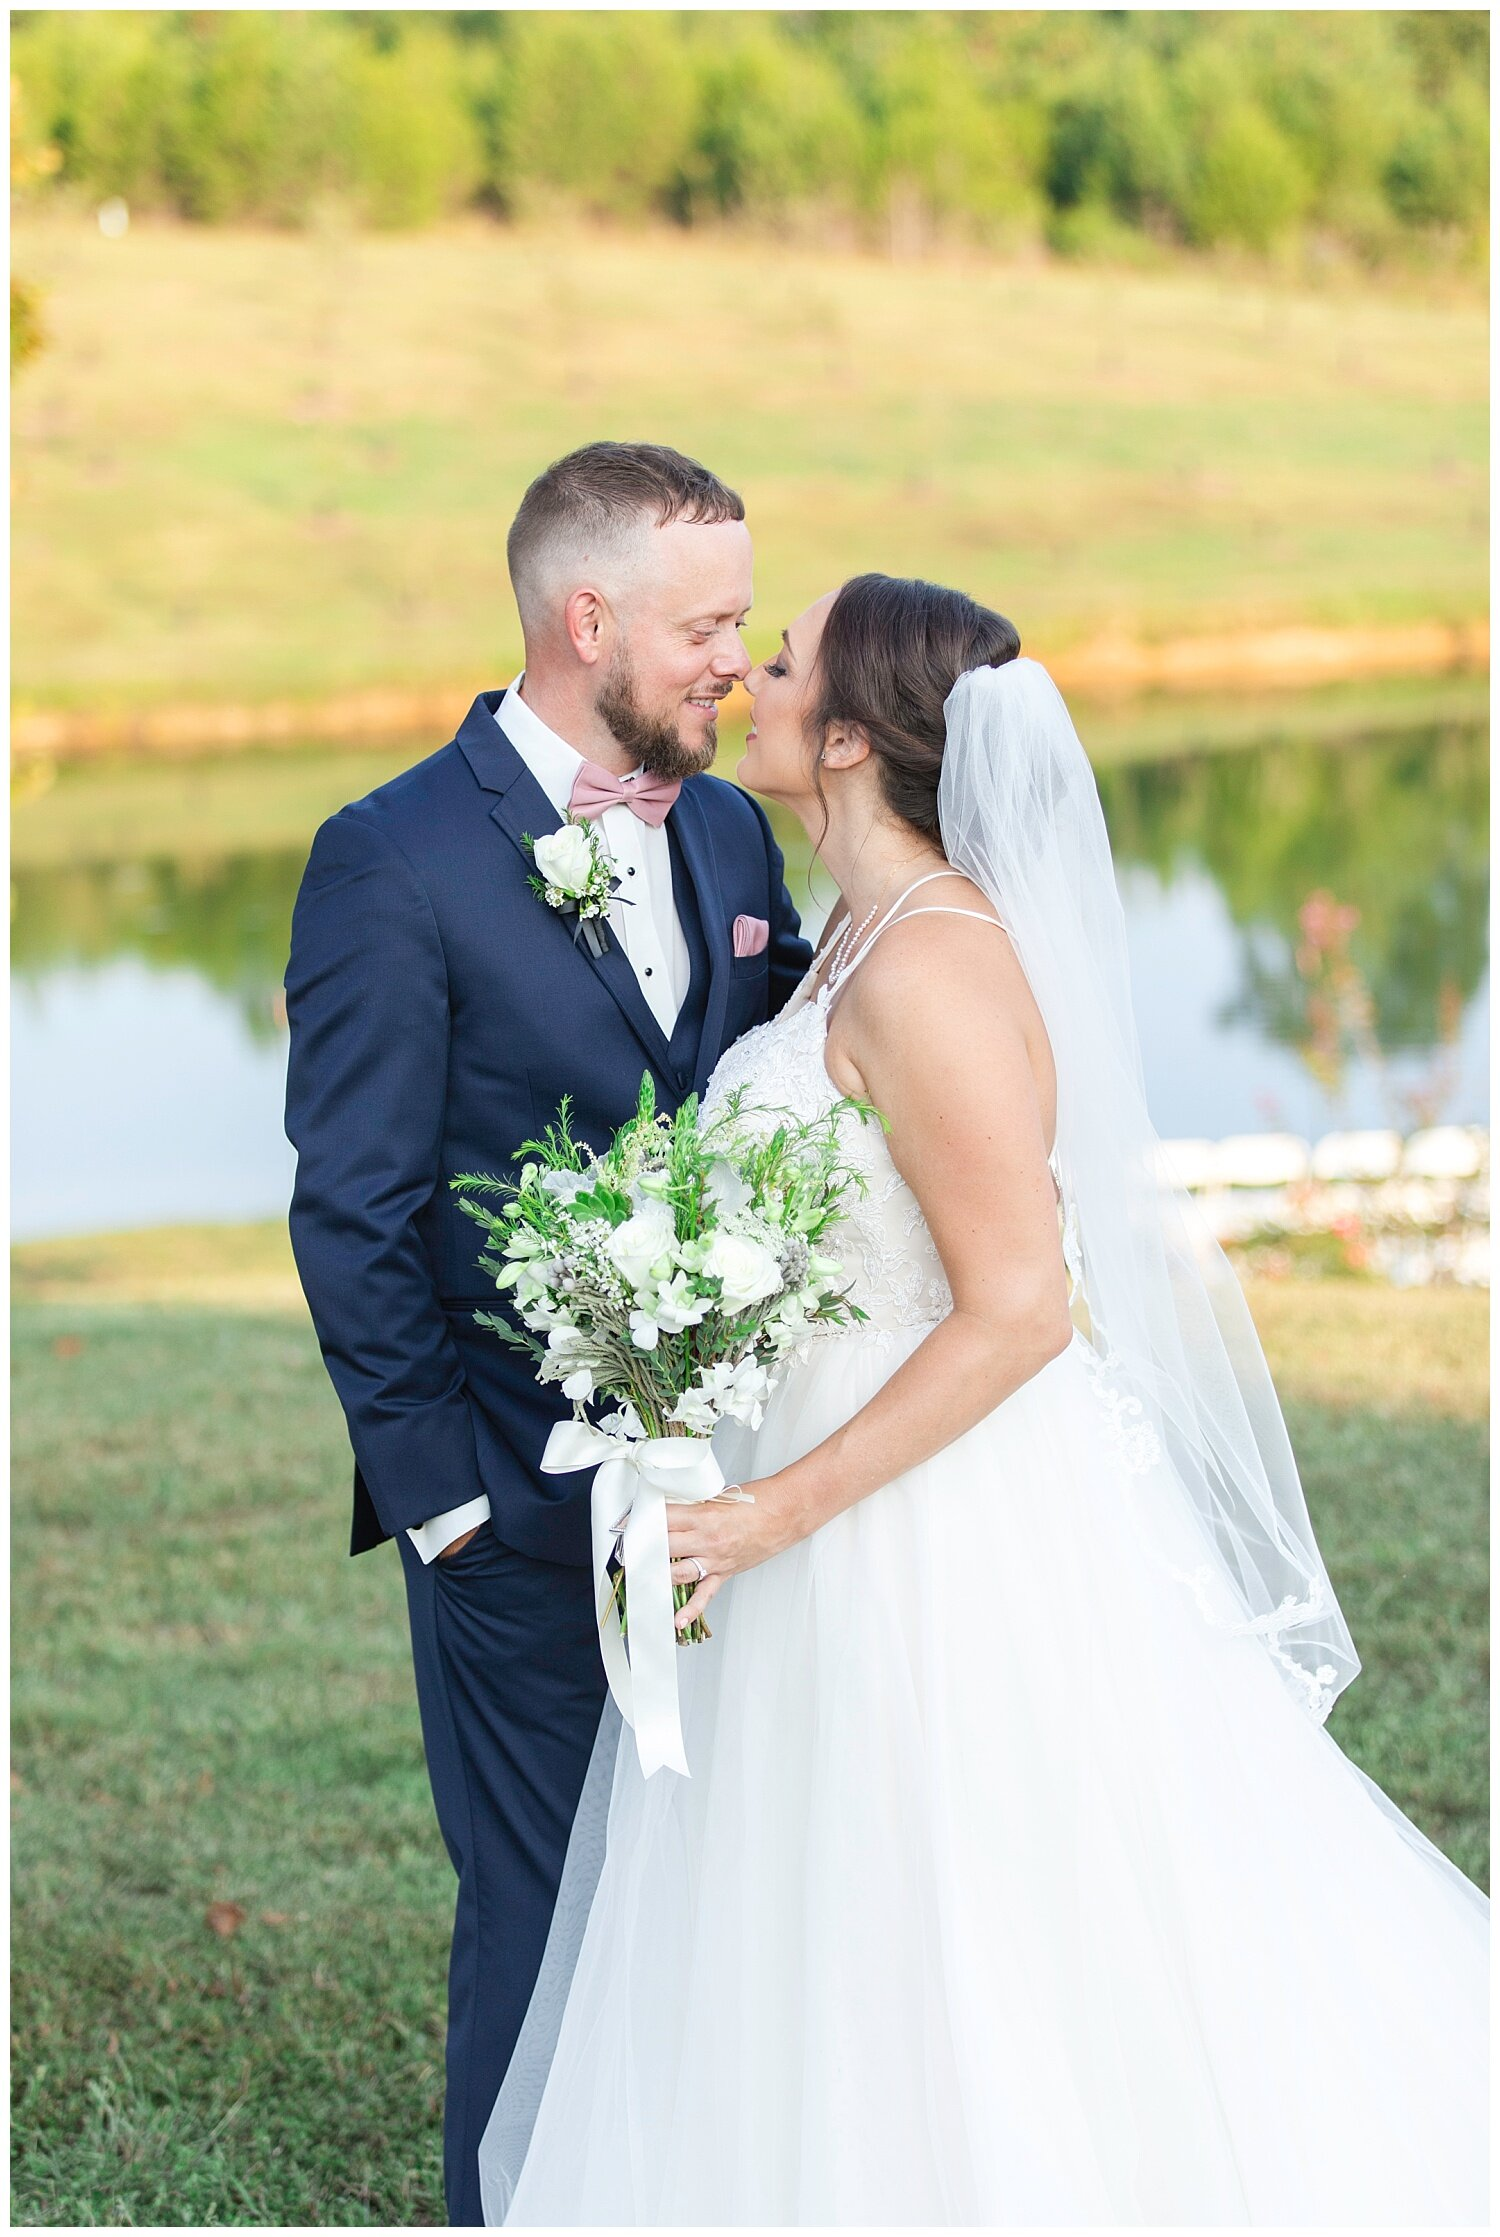 MJMP Richmond VA Wedding Photographer The Venue at Orchard View Farm Wedding Photo_0044.jpg